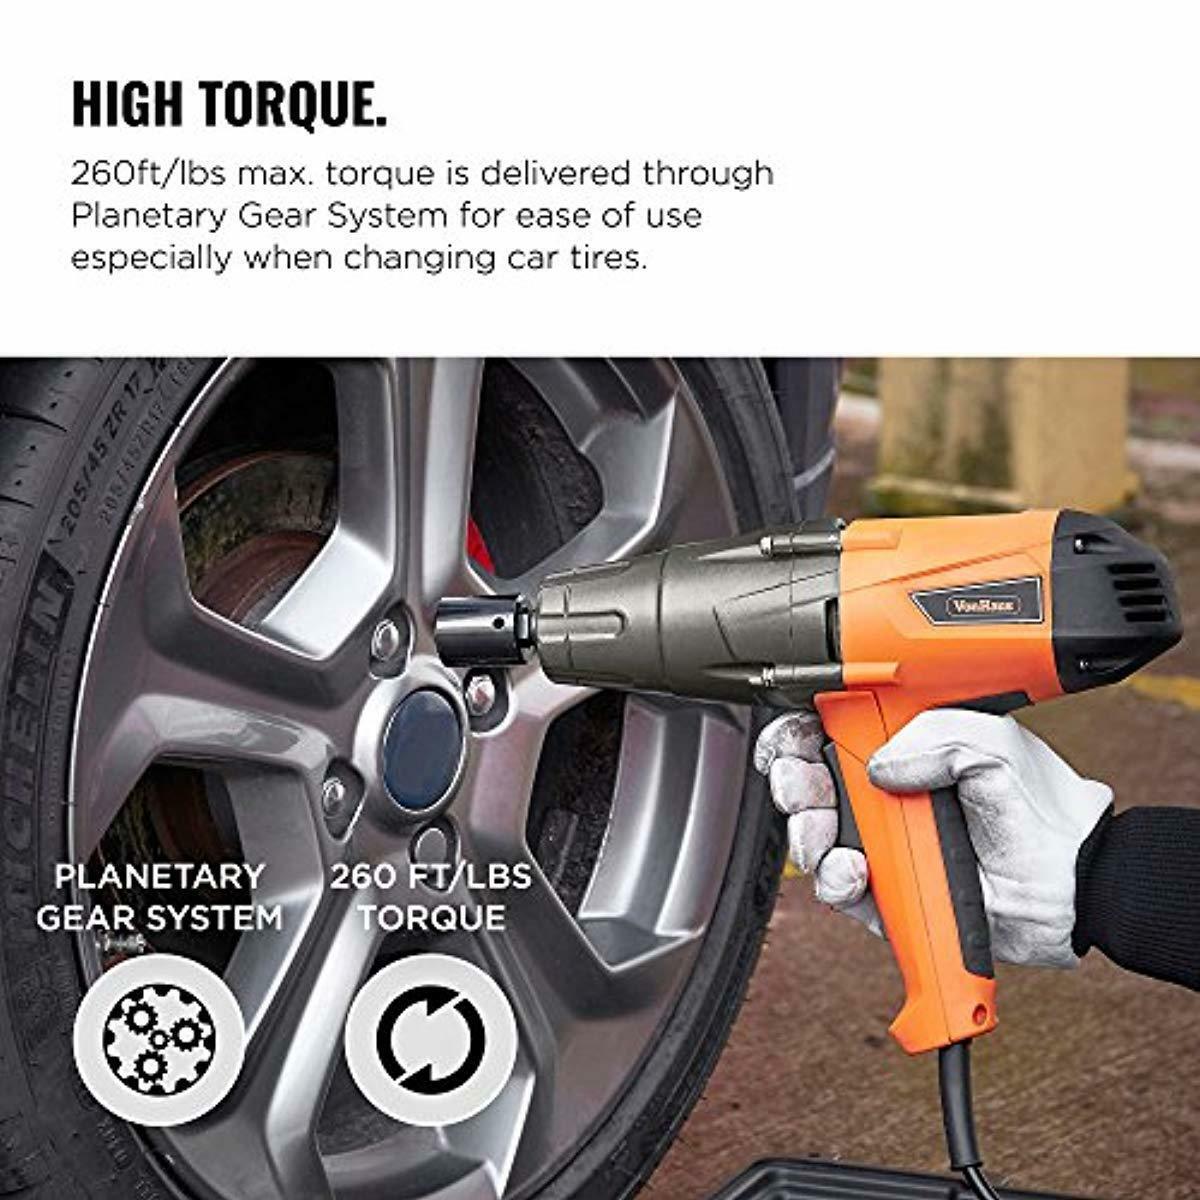 120v Impact Wrench Gun Corded Electric 1/2 Inch Lug Nut Car